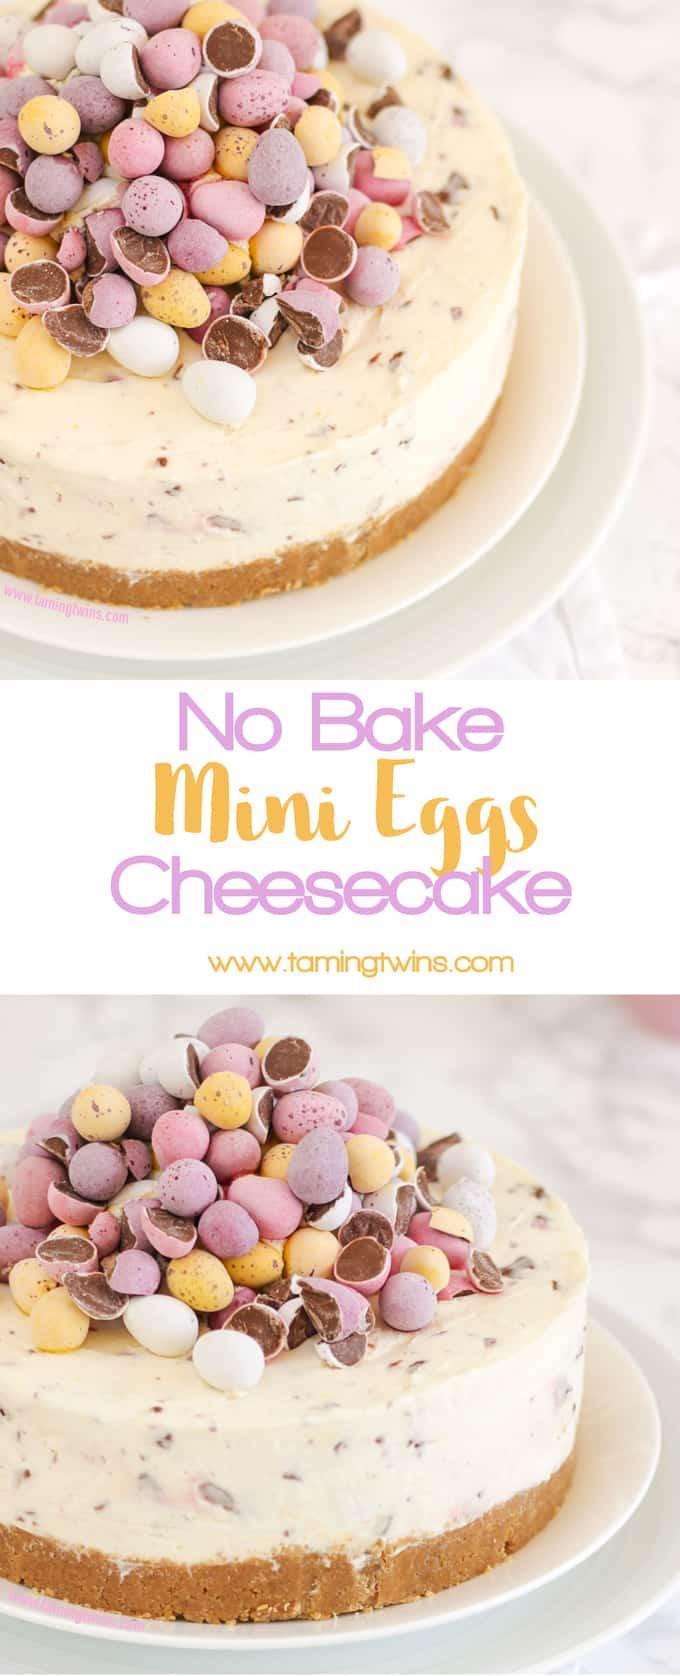 Light Easter Desserts  No Bake Mini Egg Cheesecake THE Easter Recipe Taming